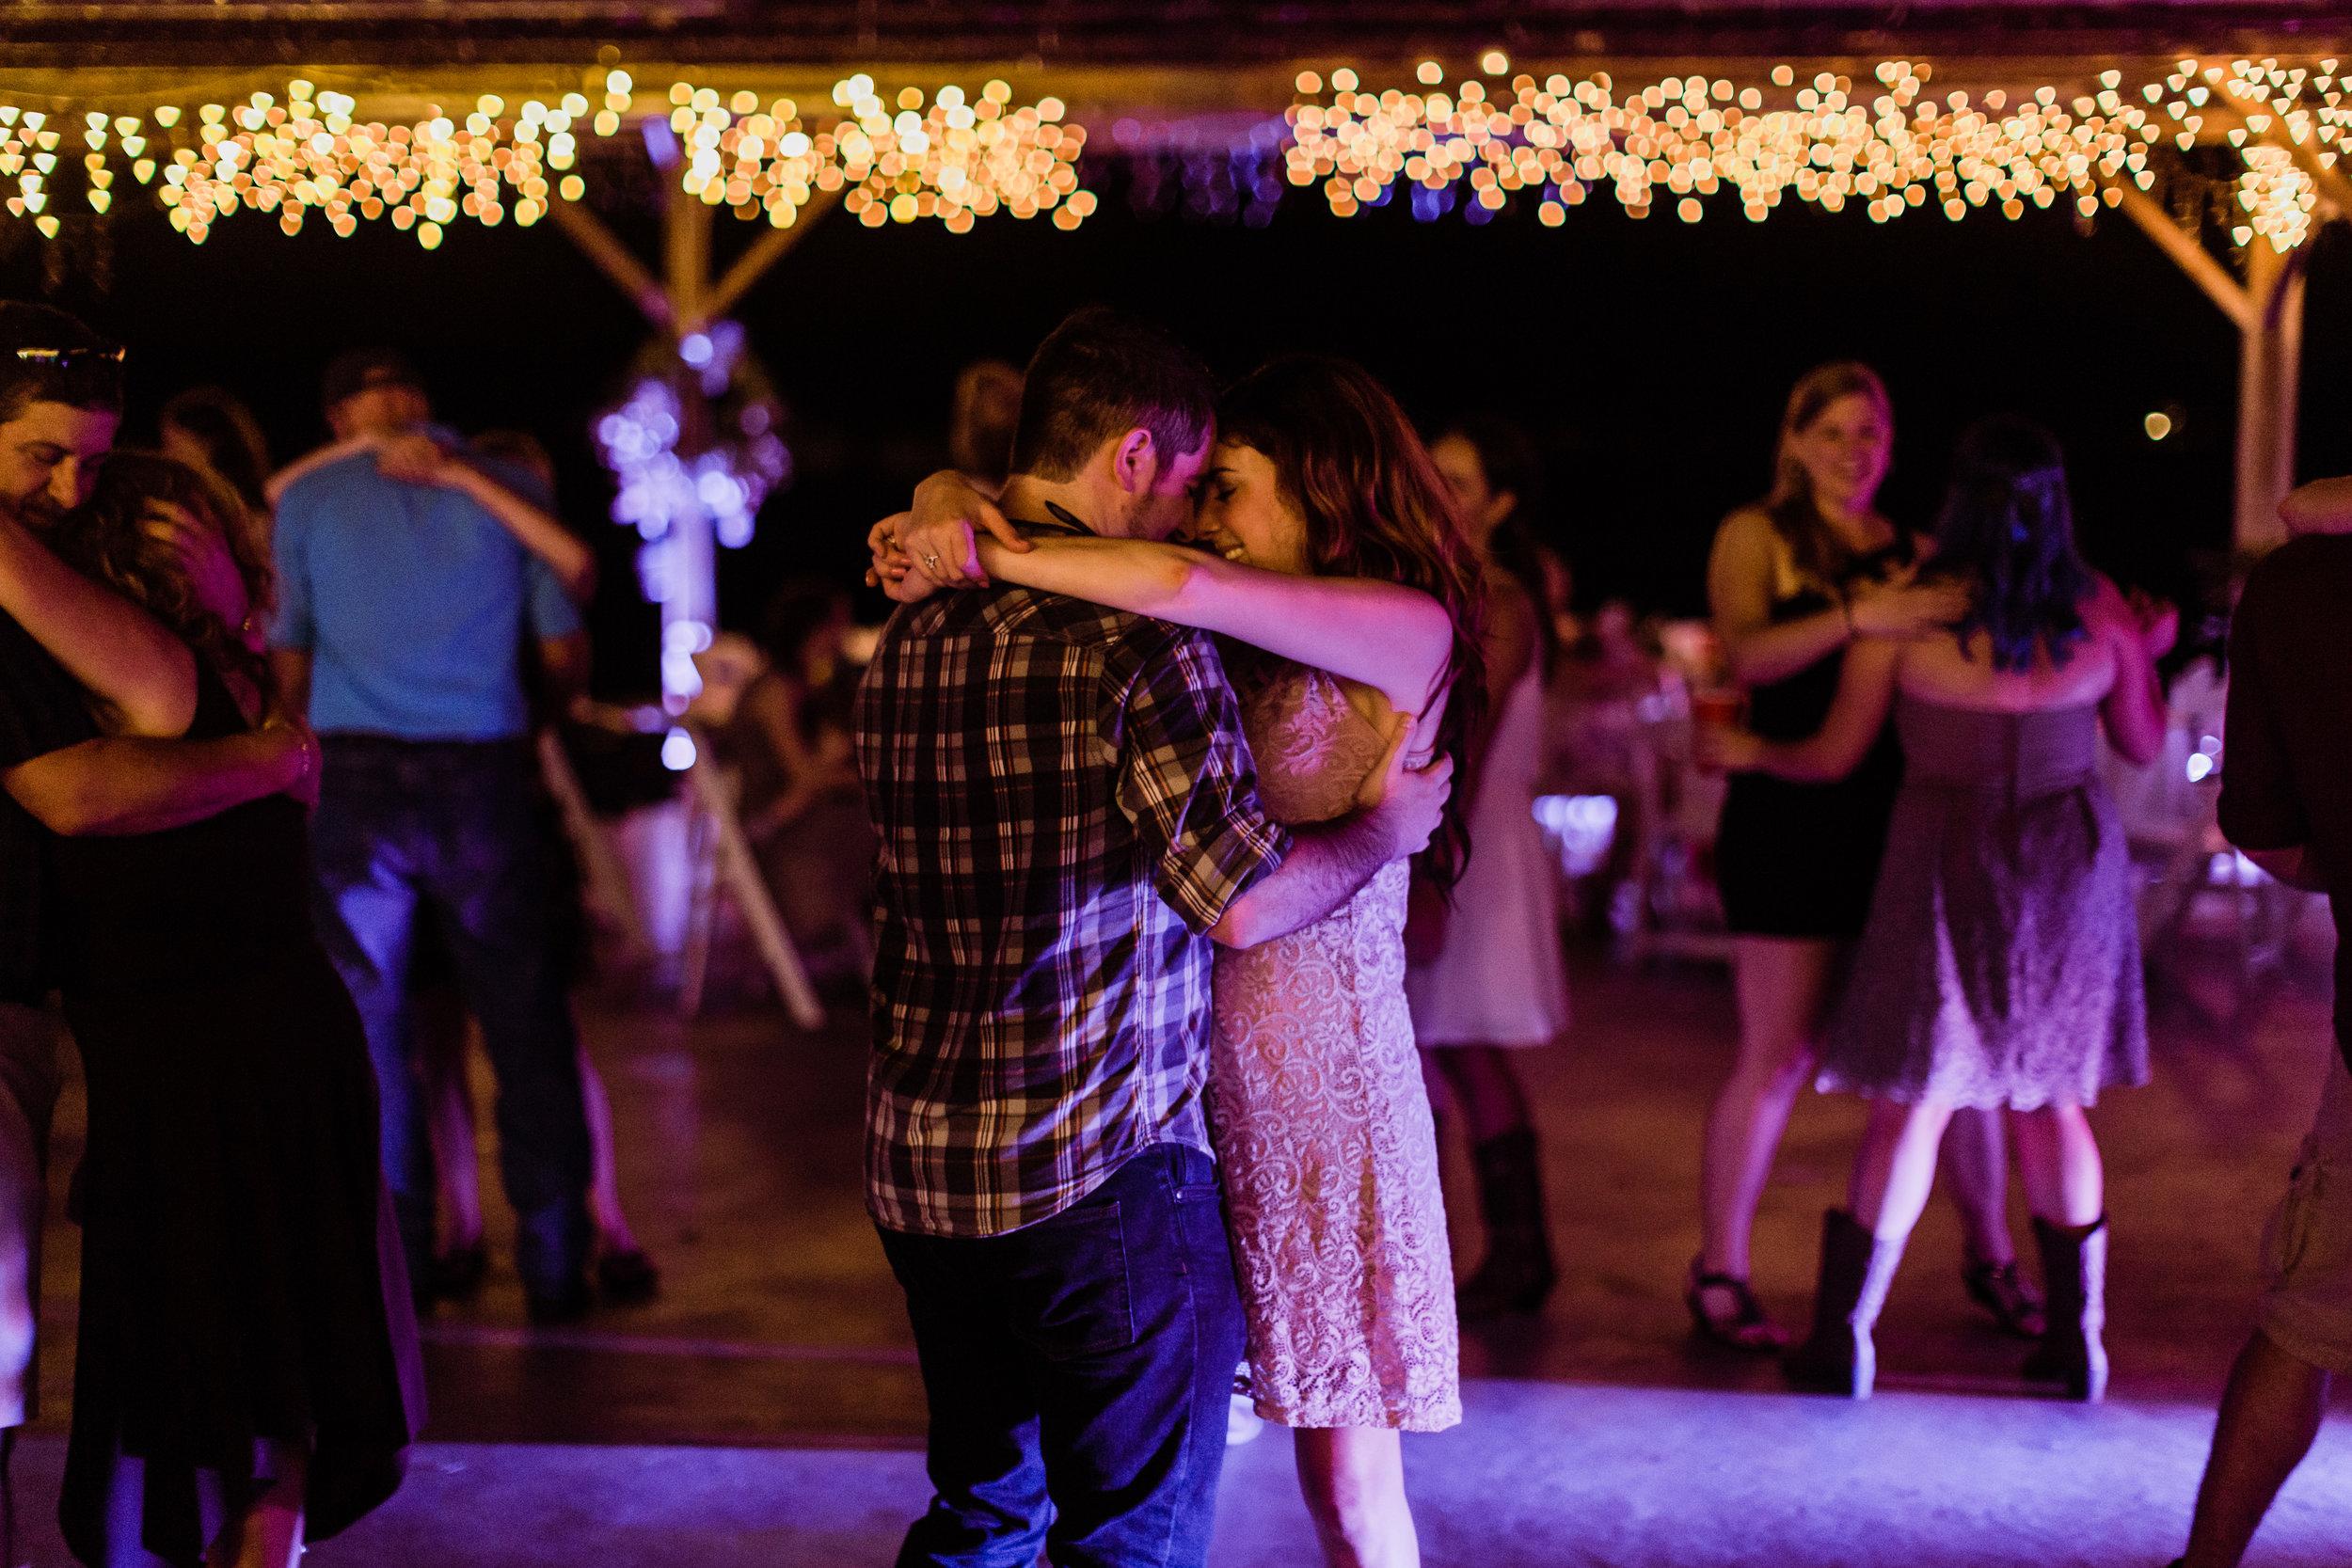 2017.10.14 Samantha and Matthew Crabtree Sarasota Wedding (611 of 708).jpg